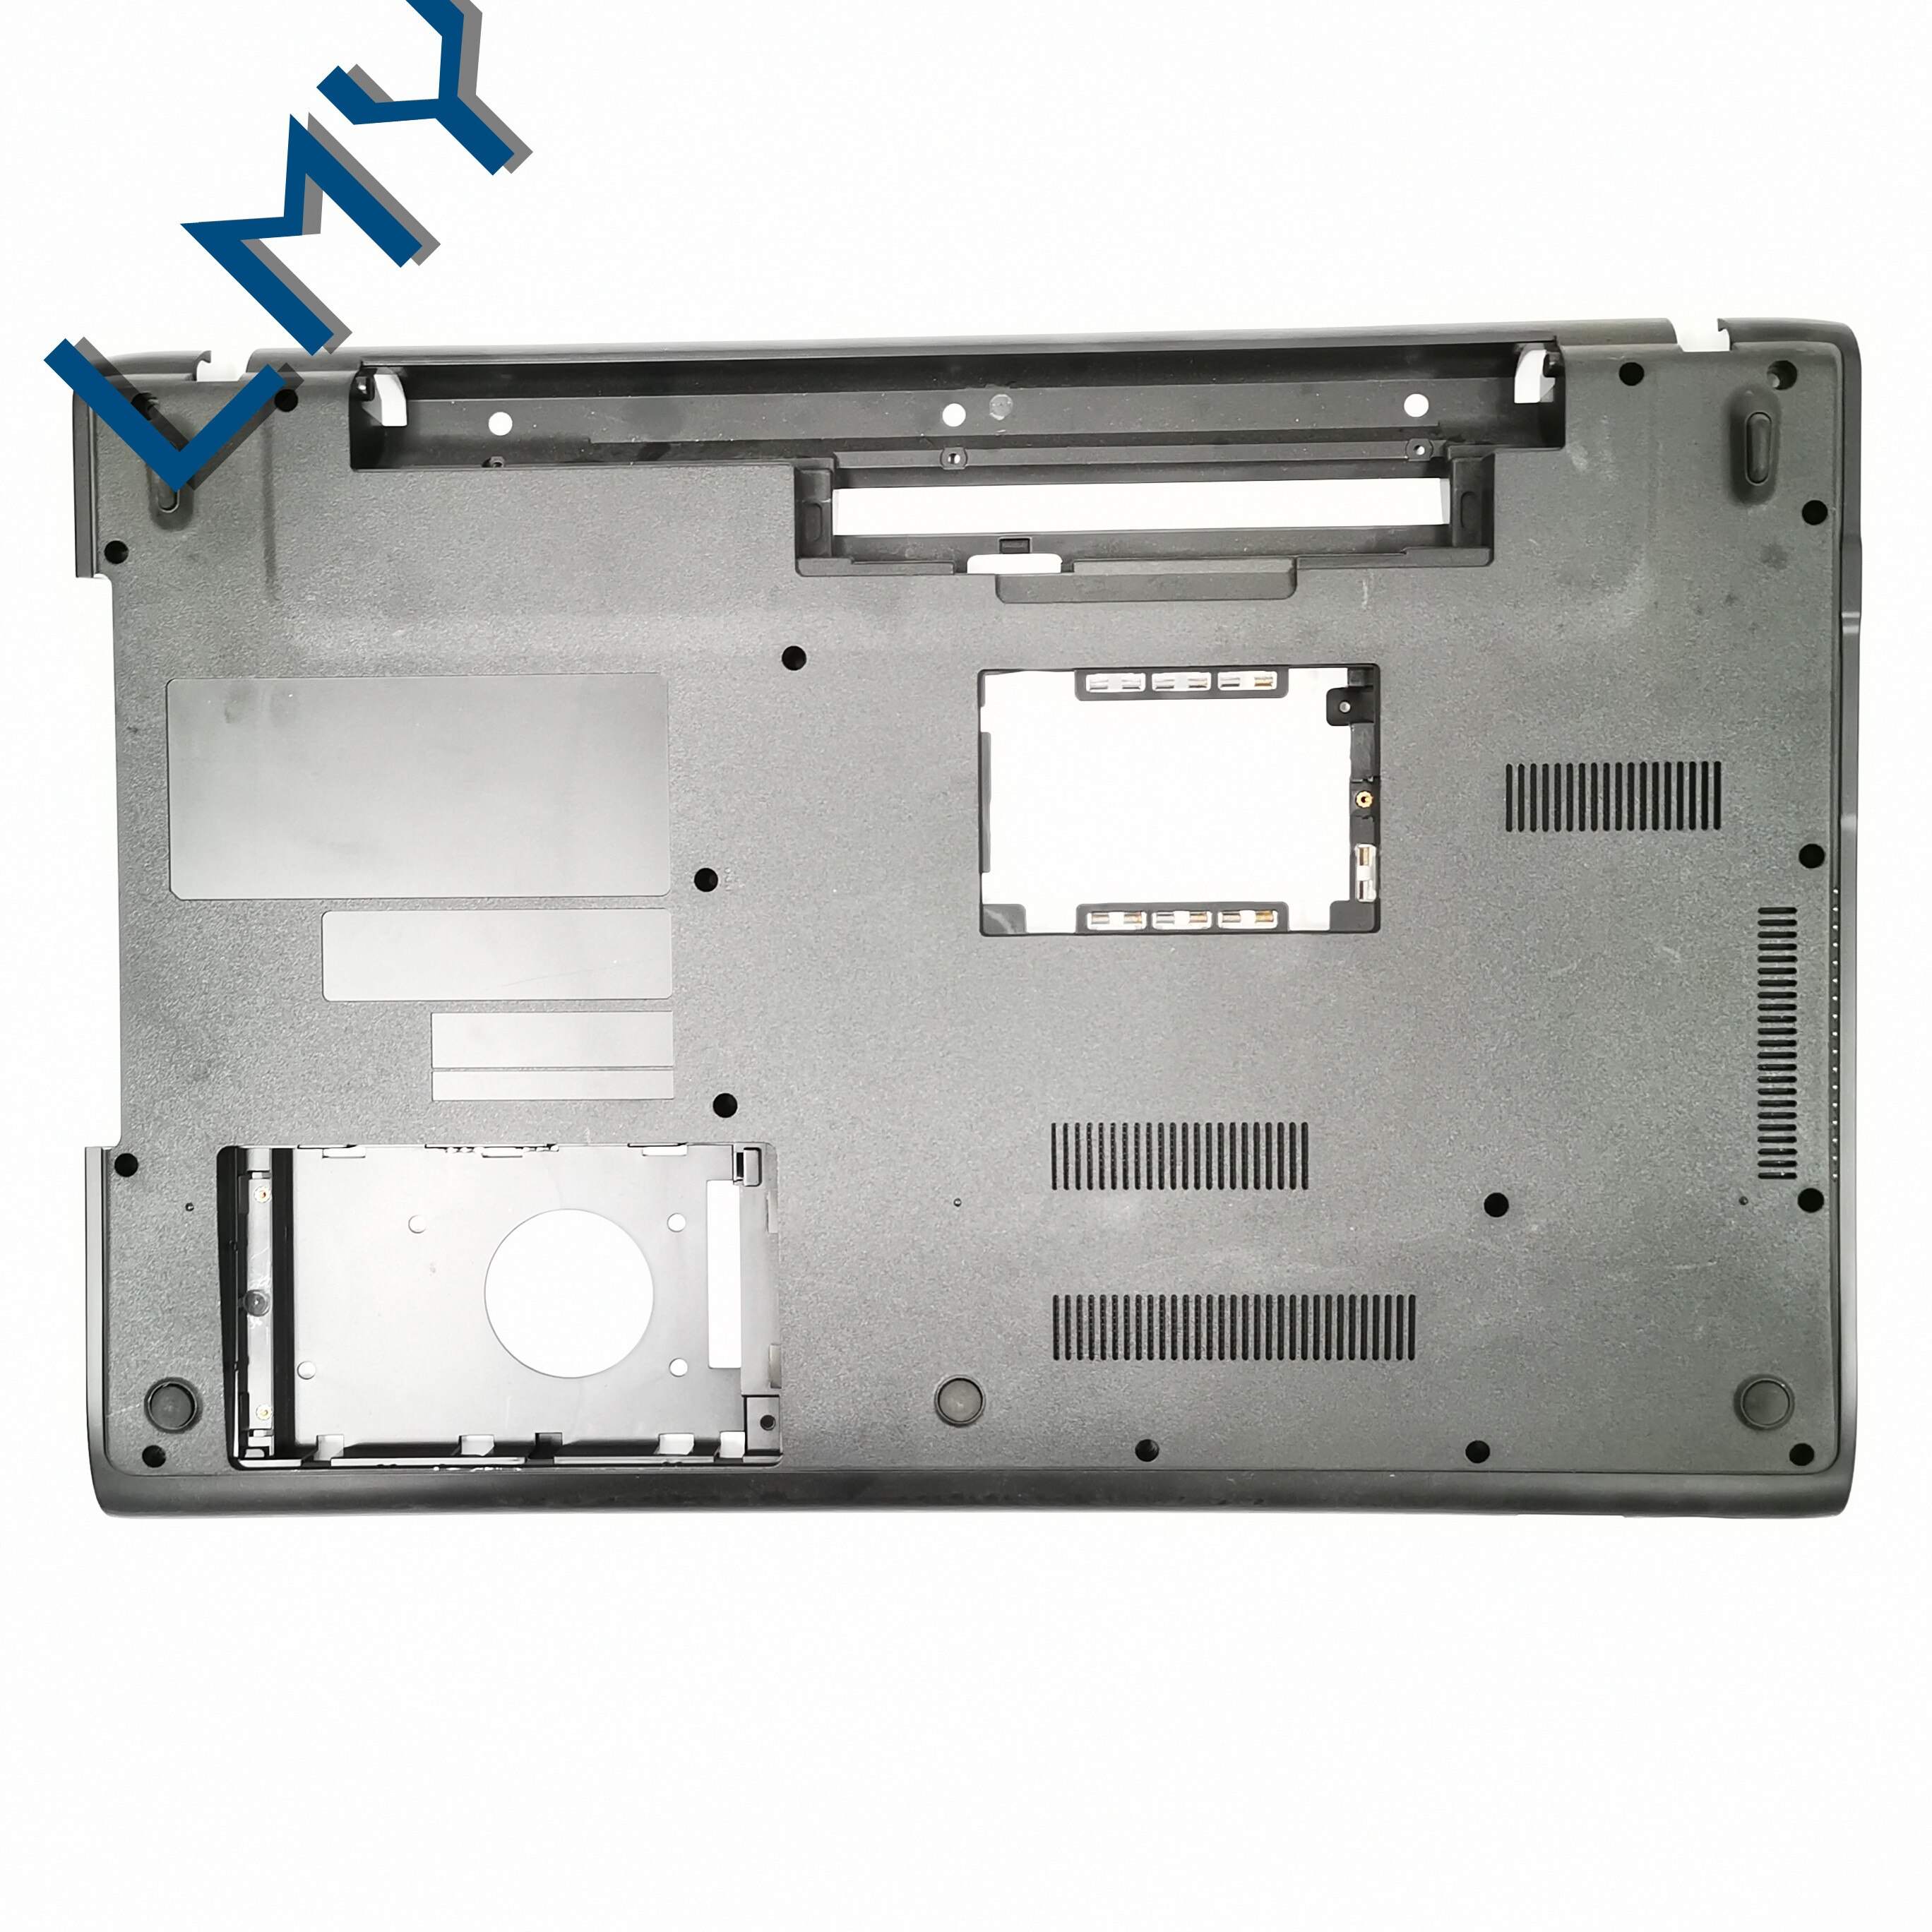 Brand new original Laptop case  for For SONY VAIO SVE171 SVE171E13M 17.3 laptop bottom base D shell  Black  SGM604MR09003